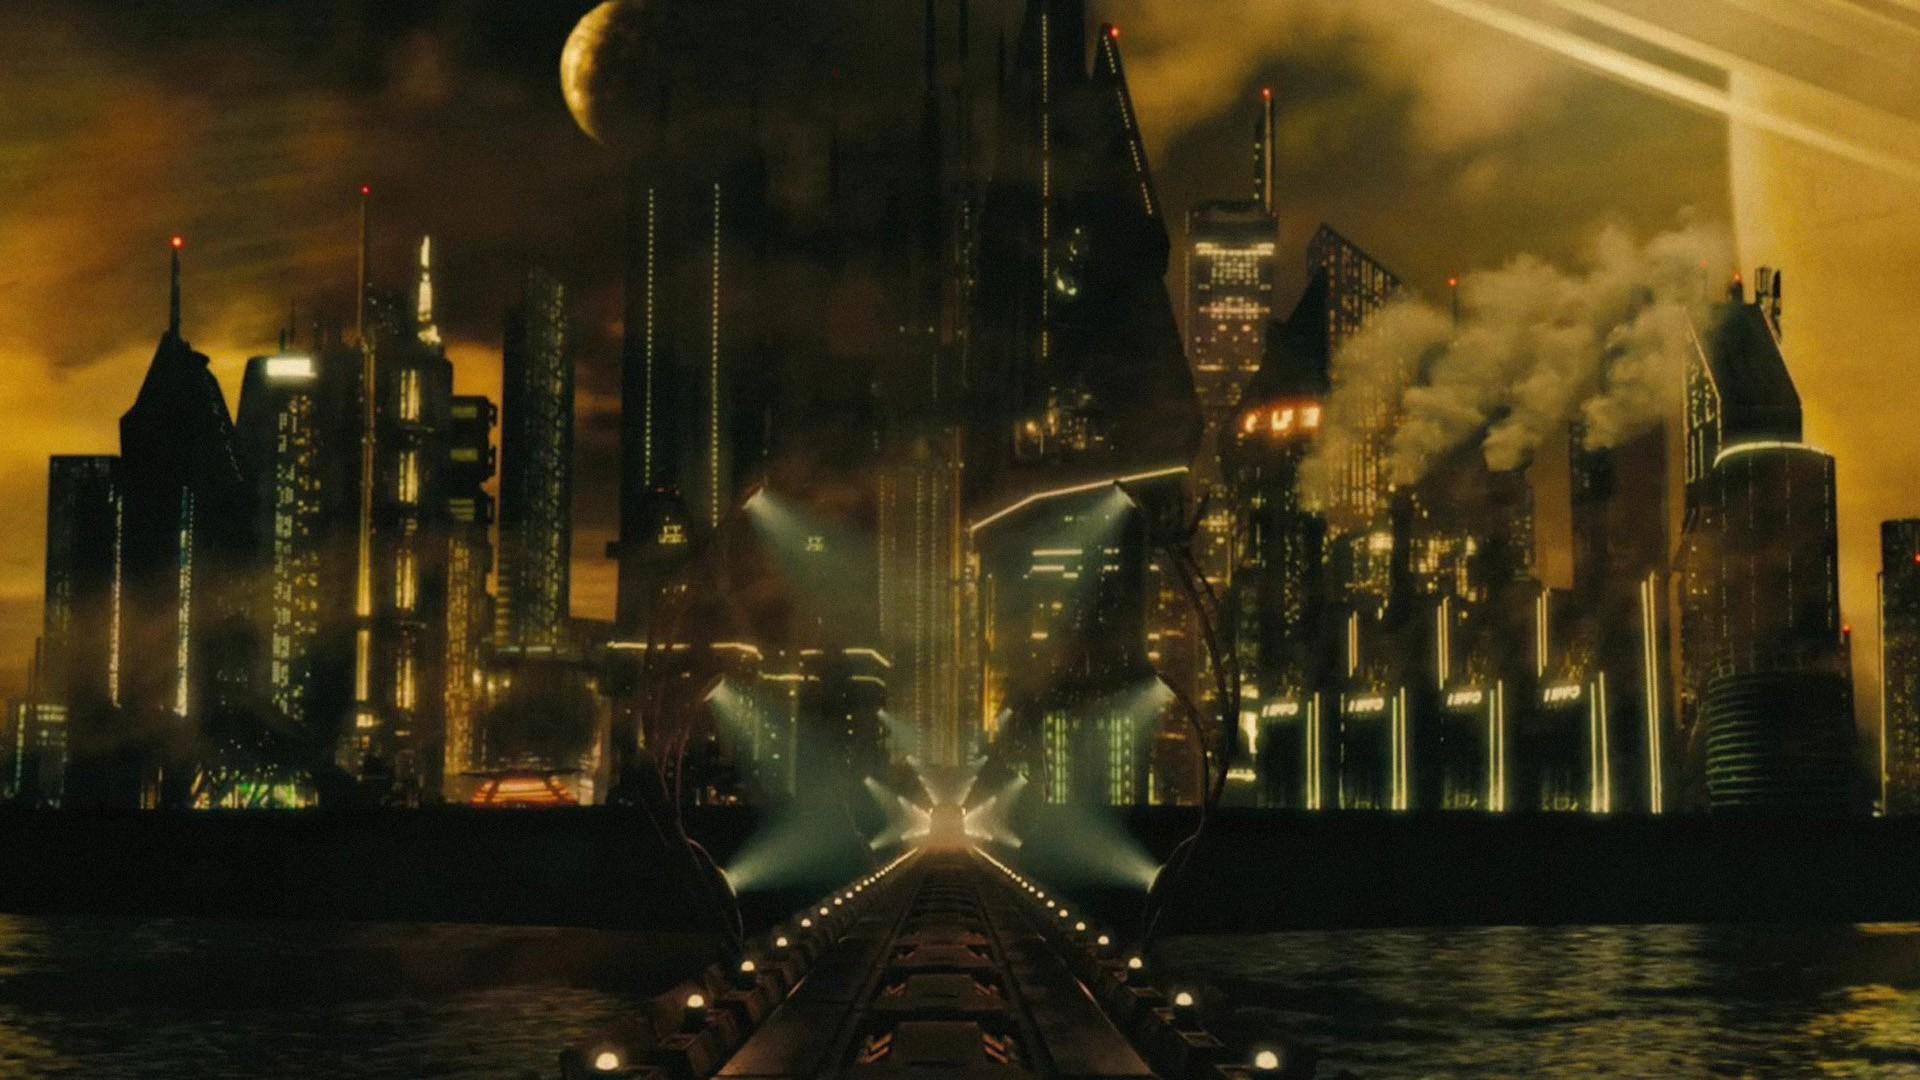 Vertical Wallpaper Hd Cars Movies Blade Runner Wallpapers Hd Desktop And Mobile